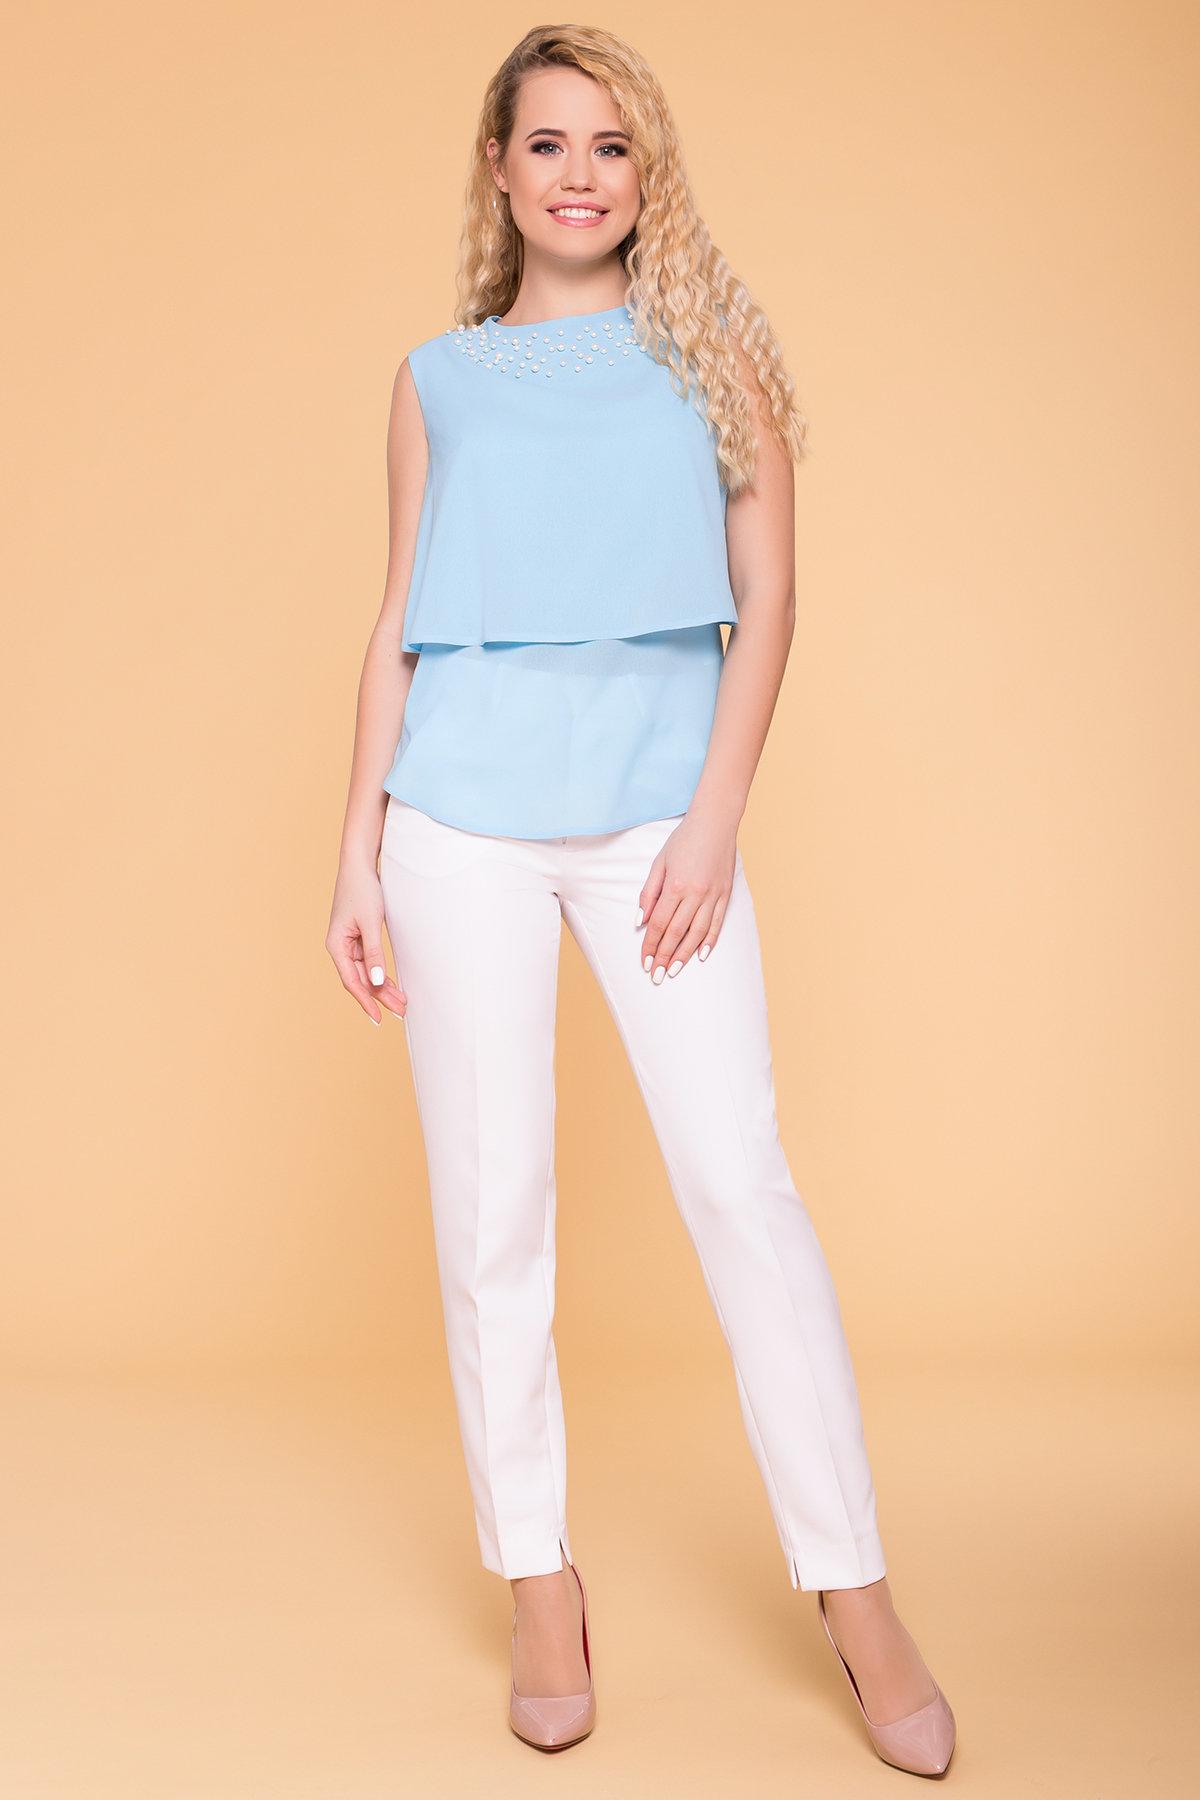 Блуза Арома 5275 АРТ. 37047 Цвет: Голубой - фото 1, интернет магазин tm-modus.ru